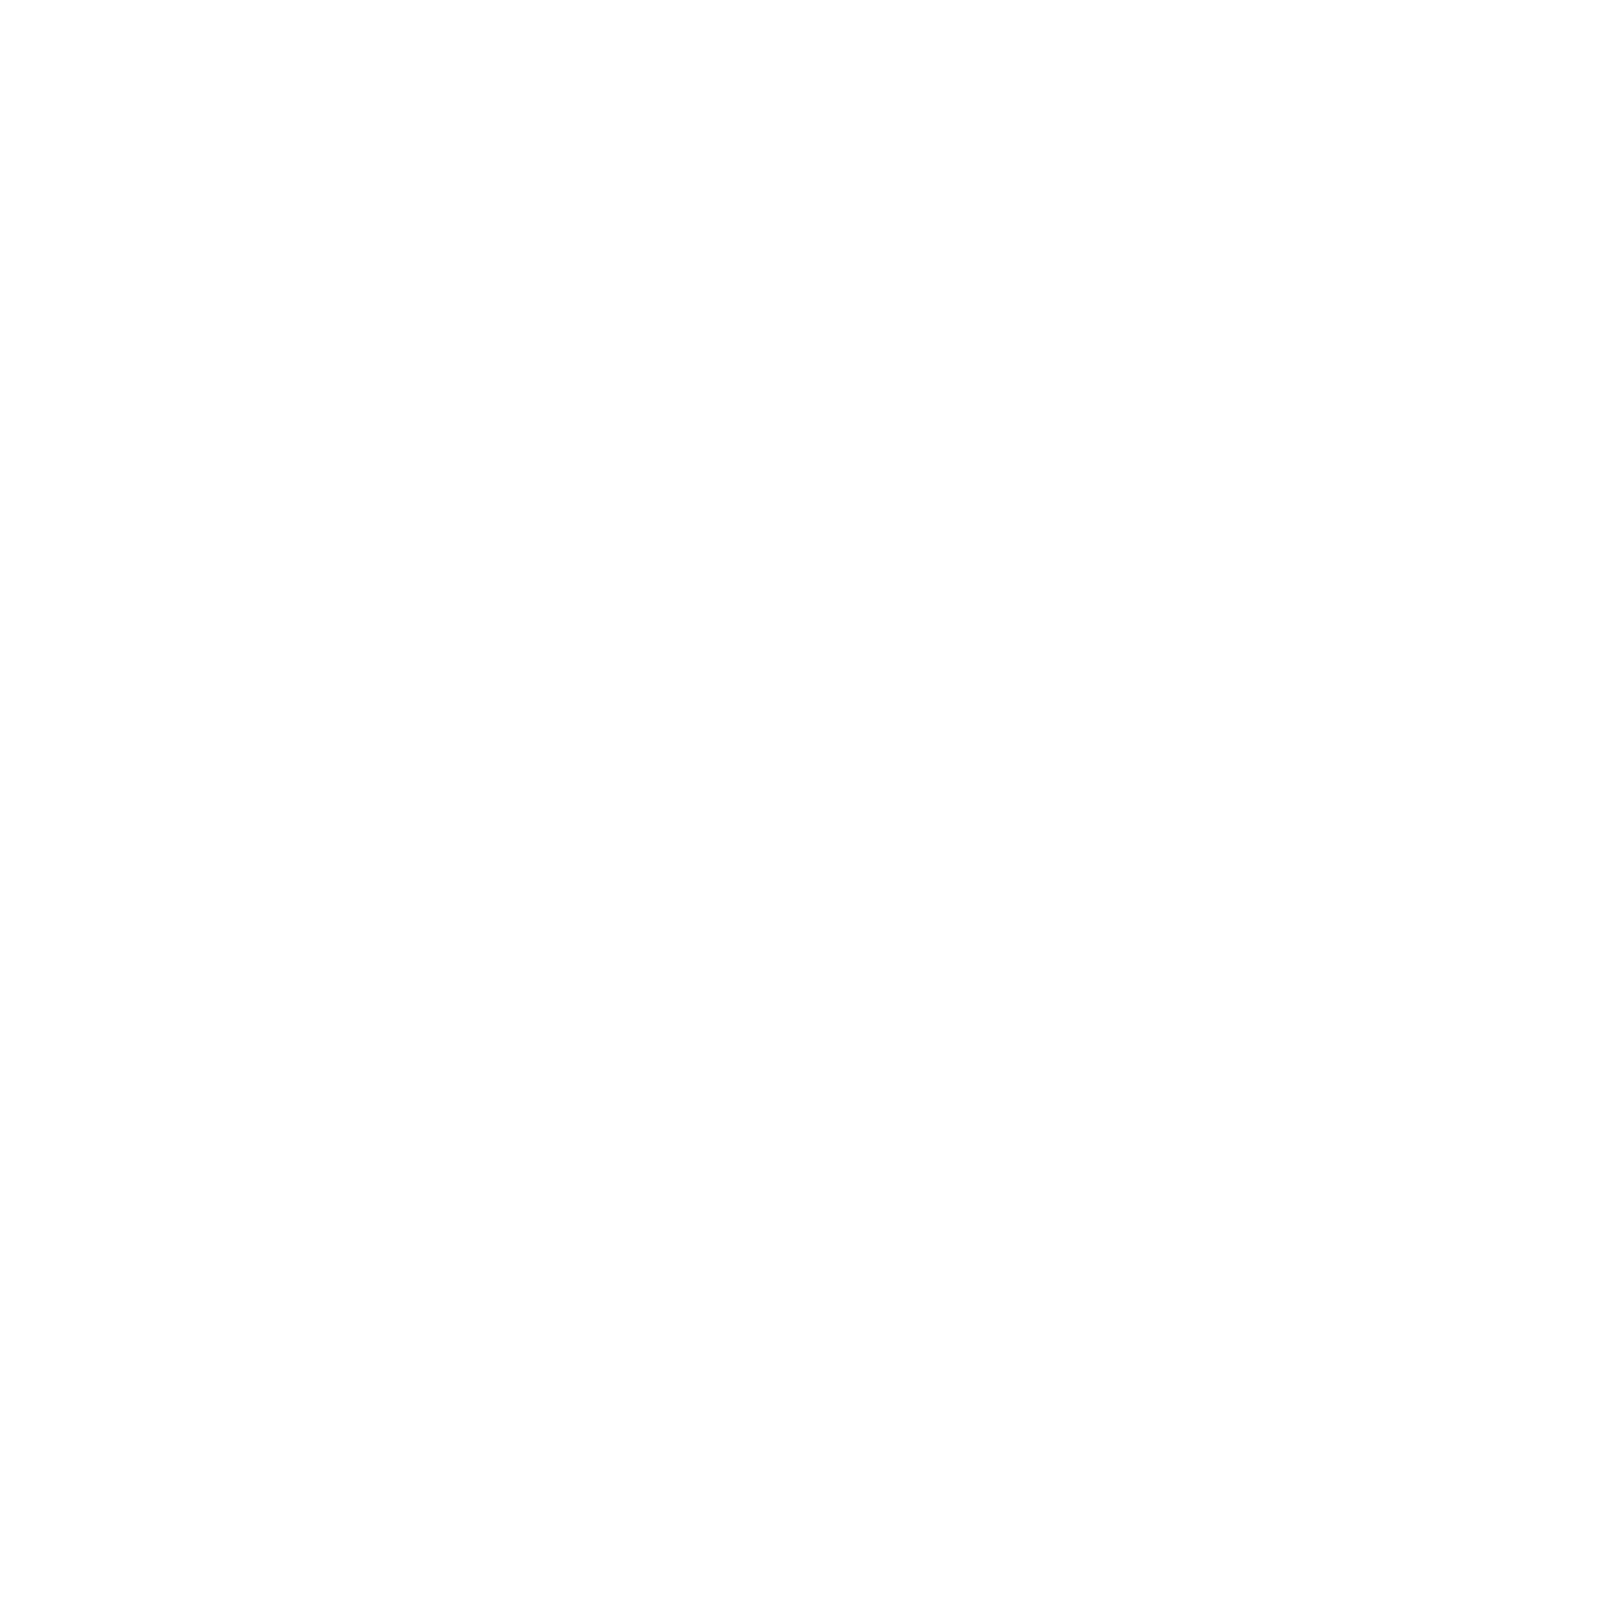 nordic-capital-project-logo